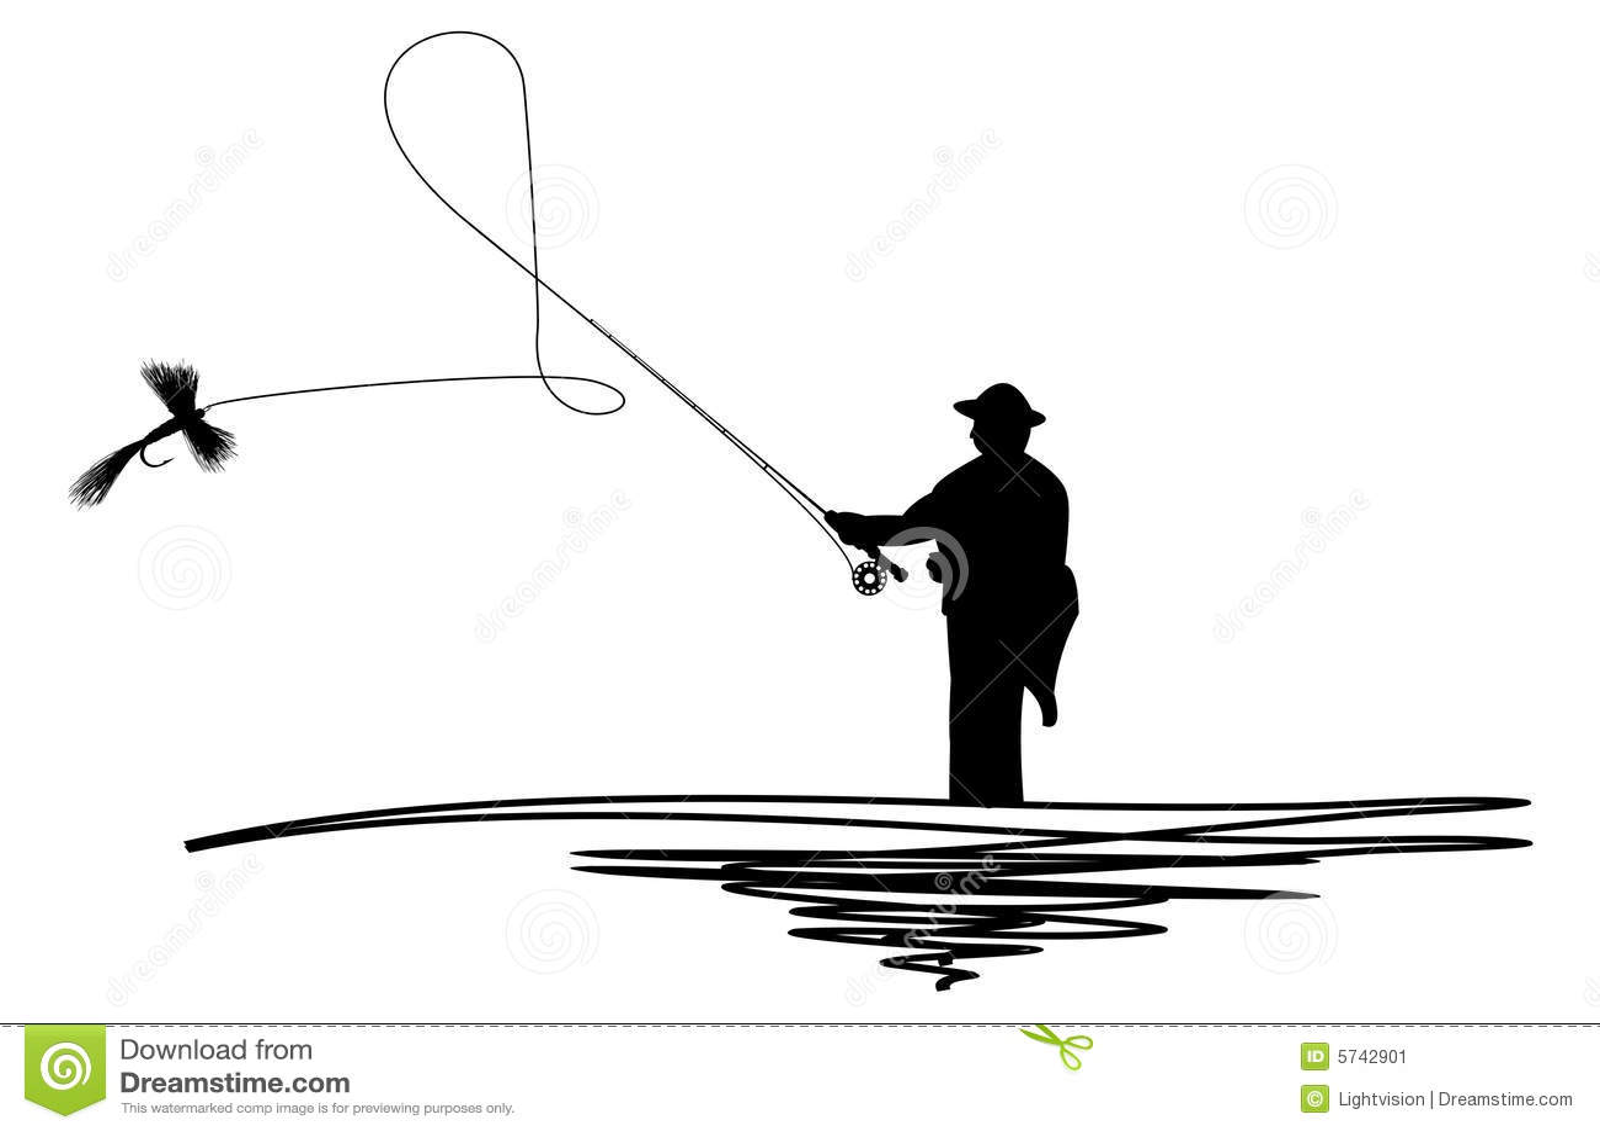 Fishing Pole And Line Tattoo